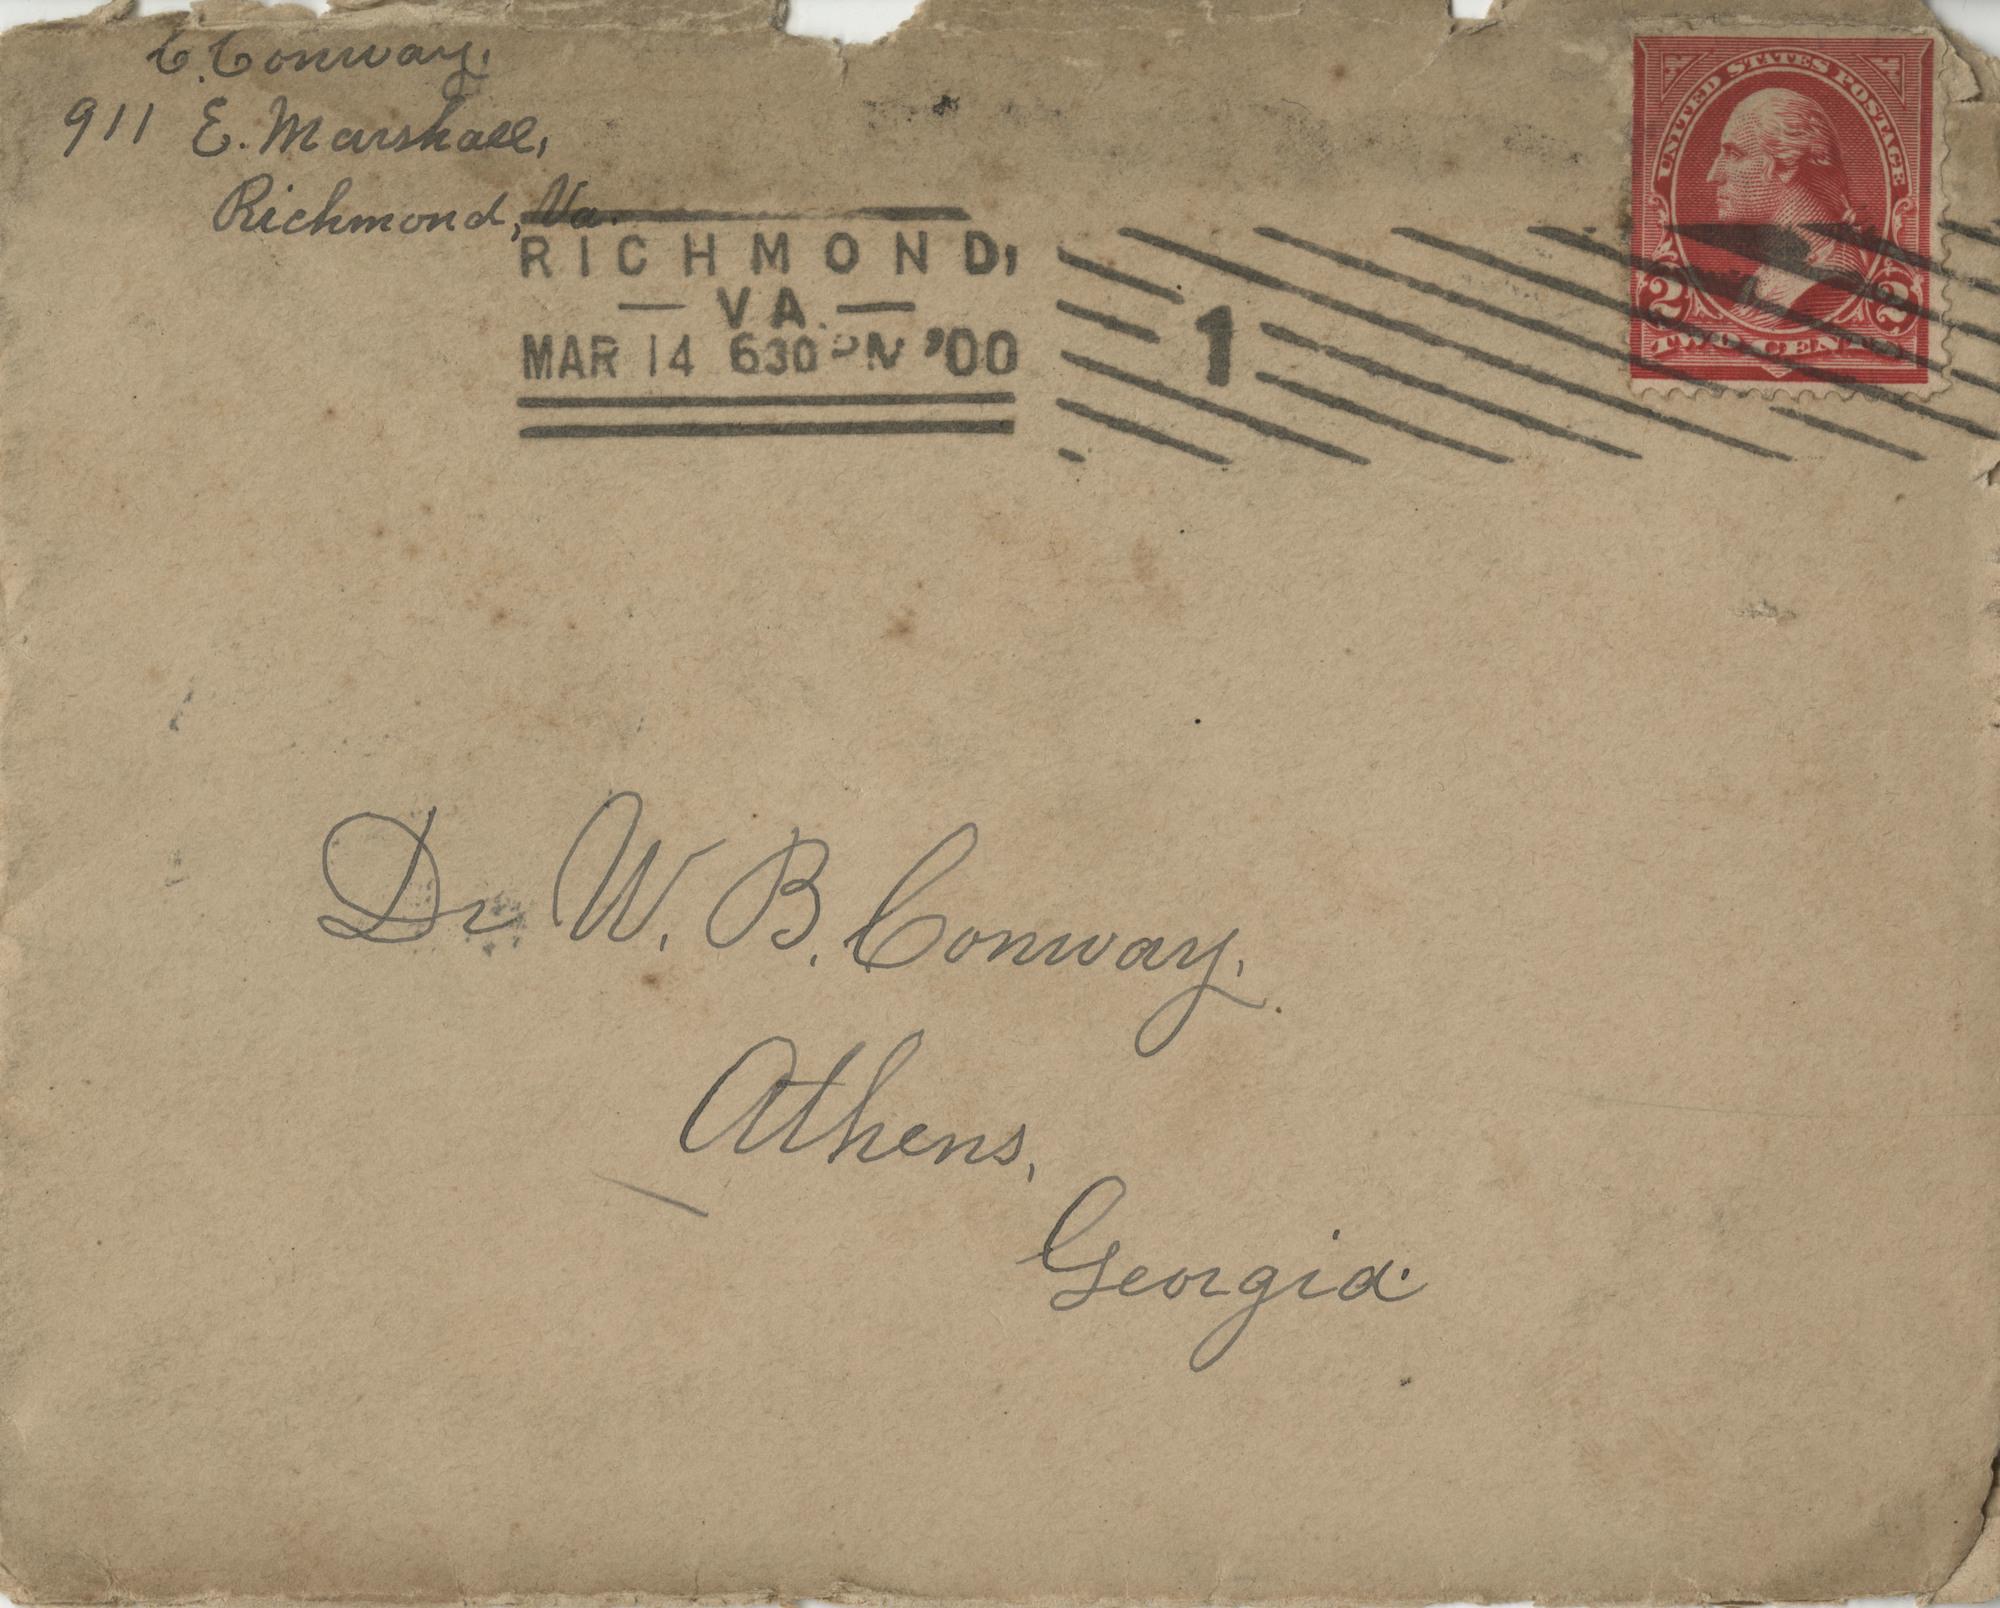 http://spec.lib.vt.edu/pickup/Omeka_upload/Ms2012-039_ConwayCatlett_F3_Letter_1900_0314_enva.jpg